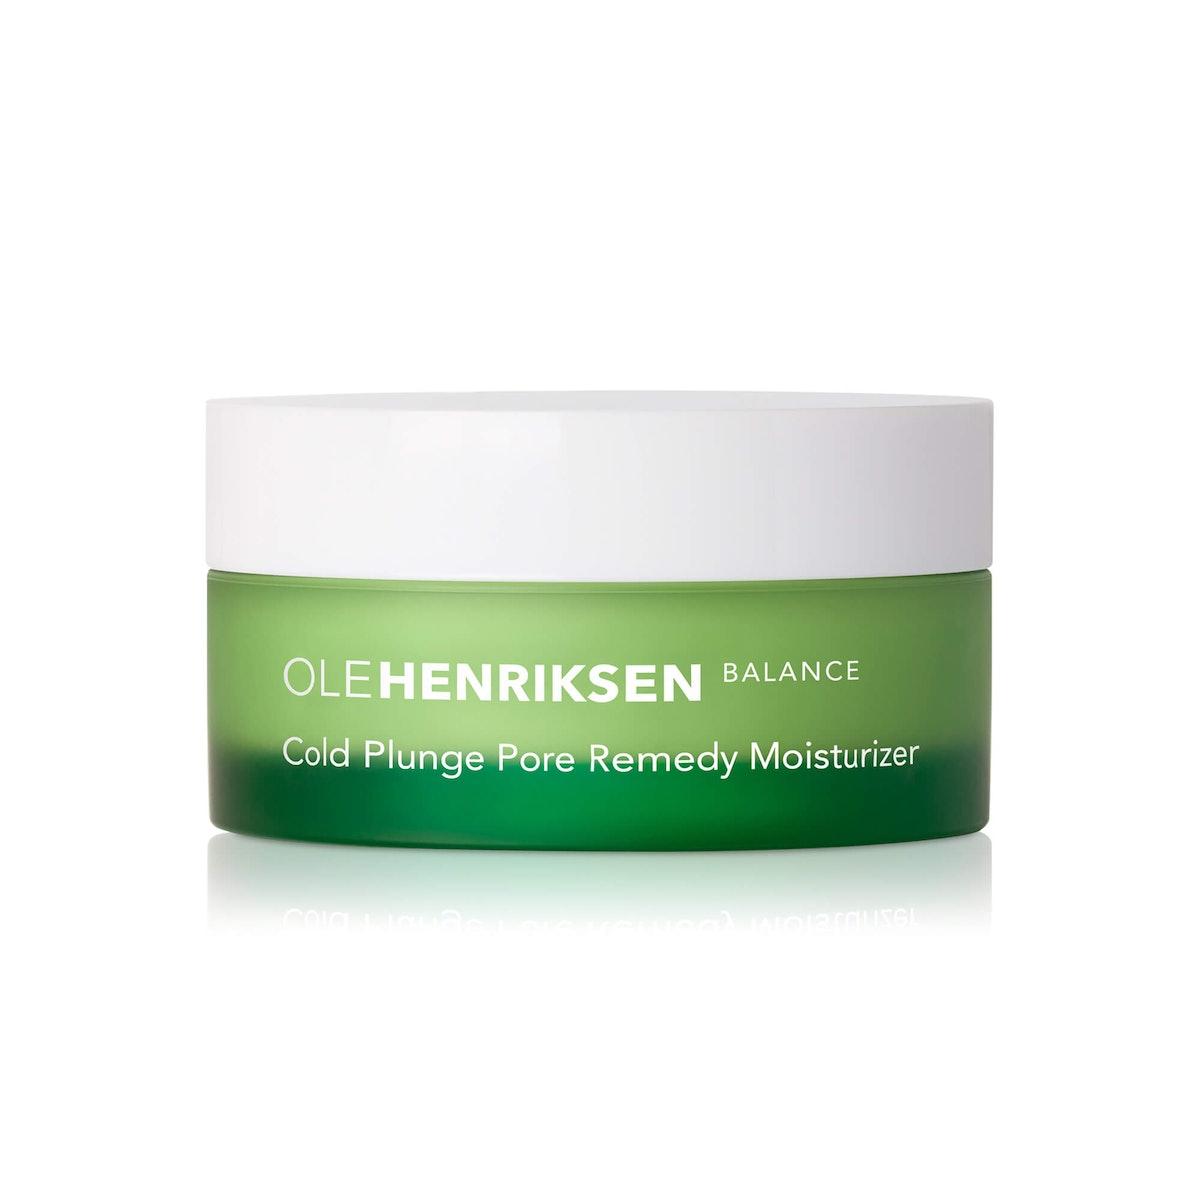 Cold Plunge Pore Remedy Moisturizer